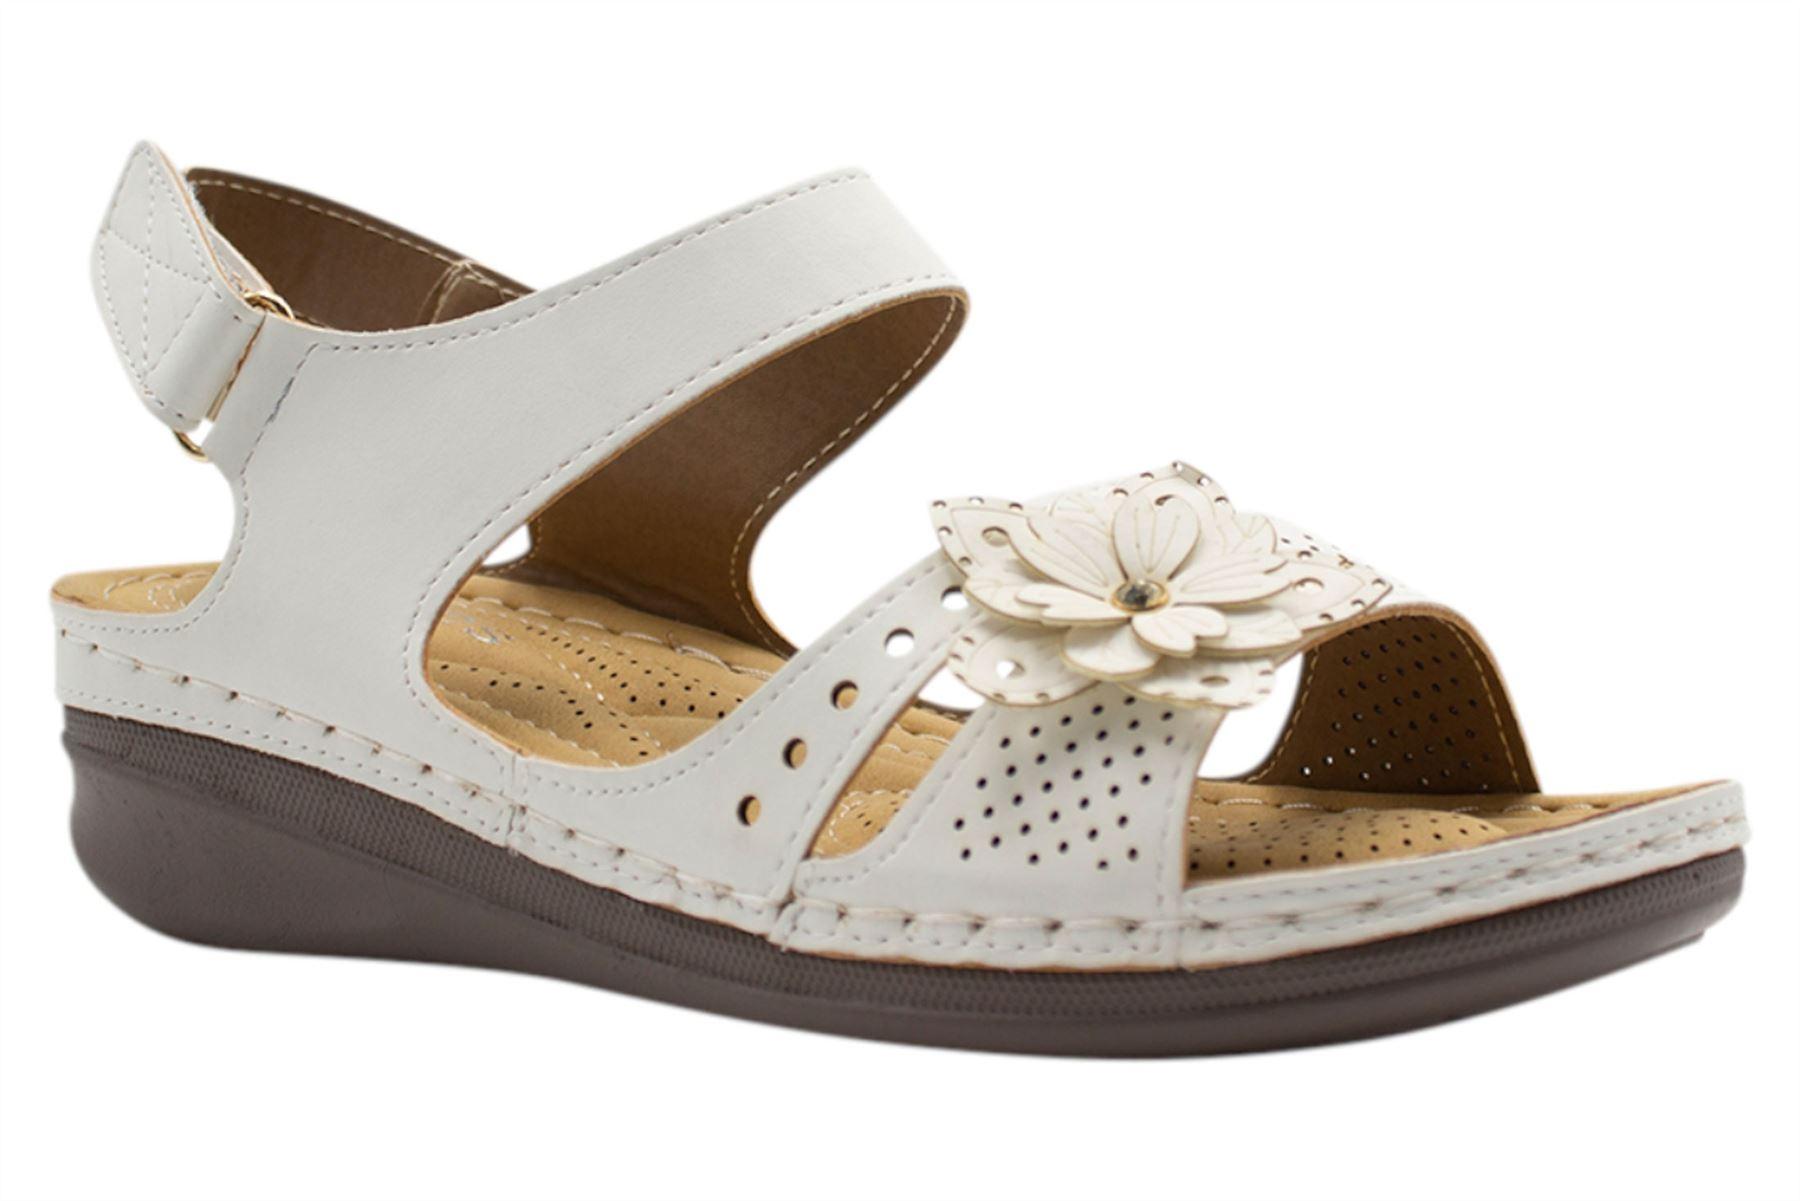 Ladies-Wedge-Heel-Sandal-Womens-Comfort-Cushion-Strapy-Summer-Shoes miniatura 46